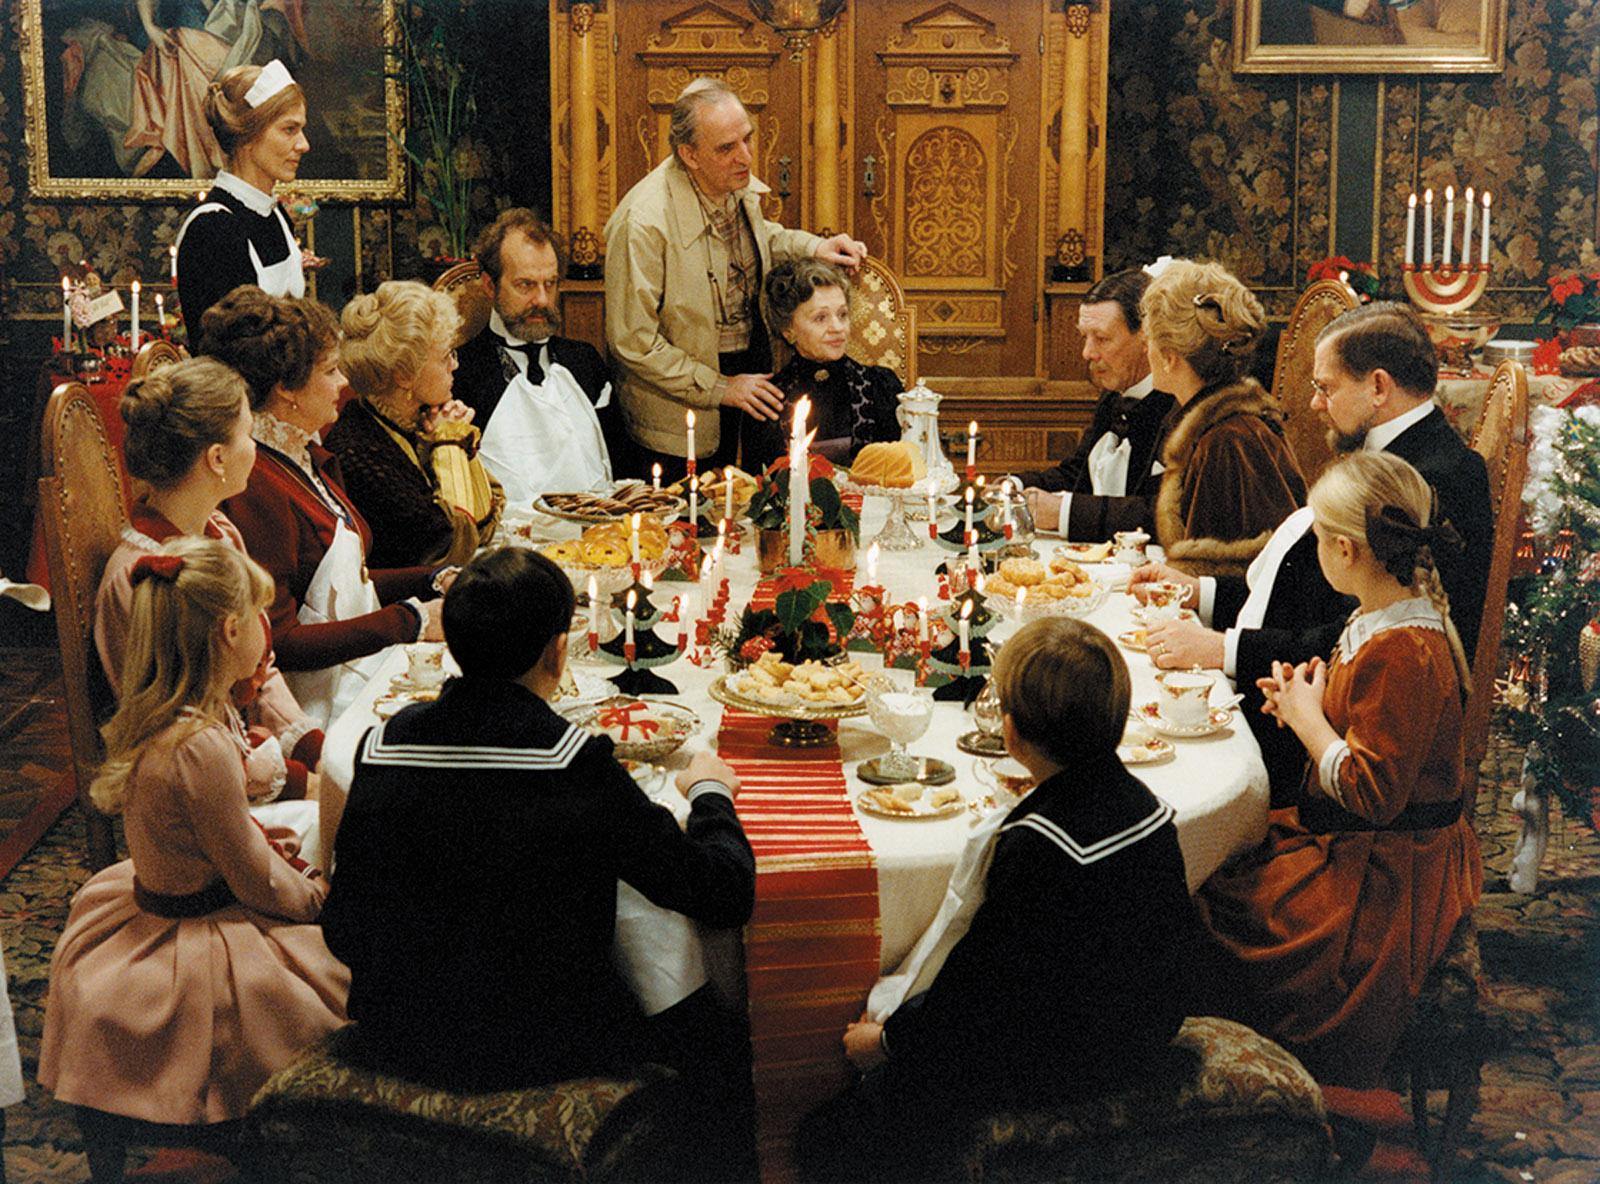 ngmar Bergman on the set of Fanny and Alexander